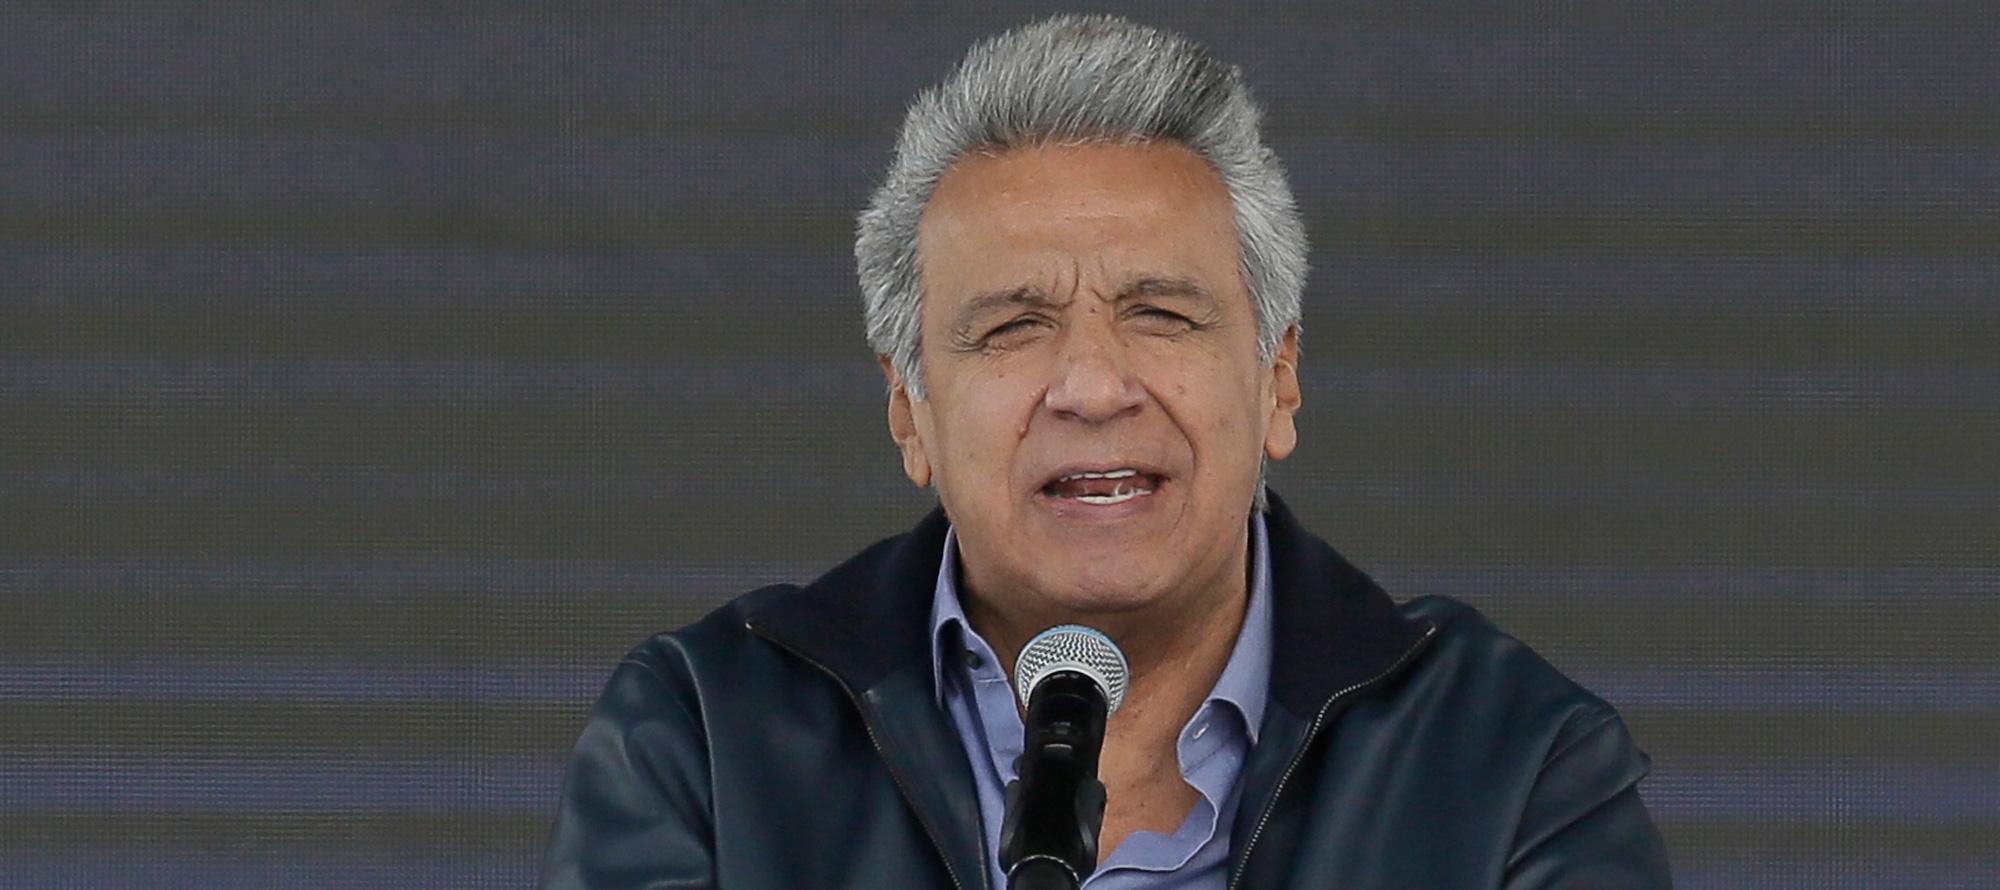 Ecuador's President Lenin Moreno speaks during the inauguration of the